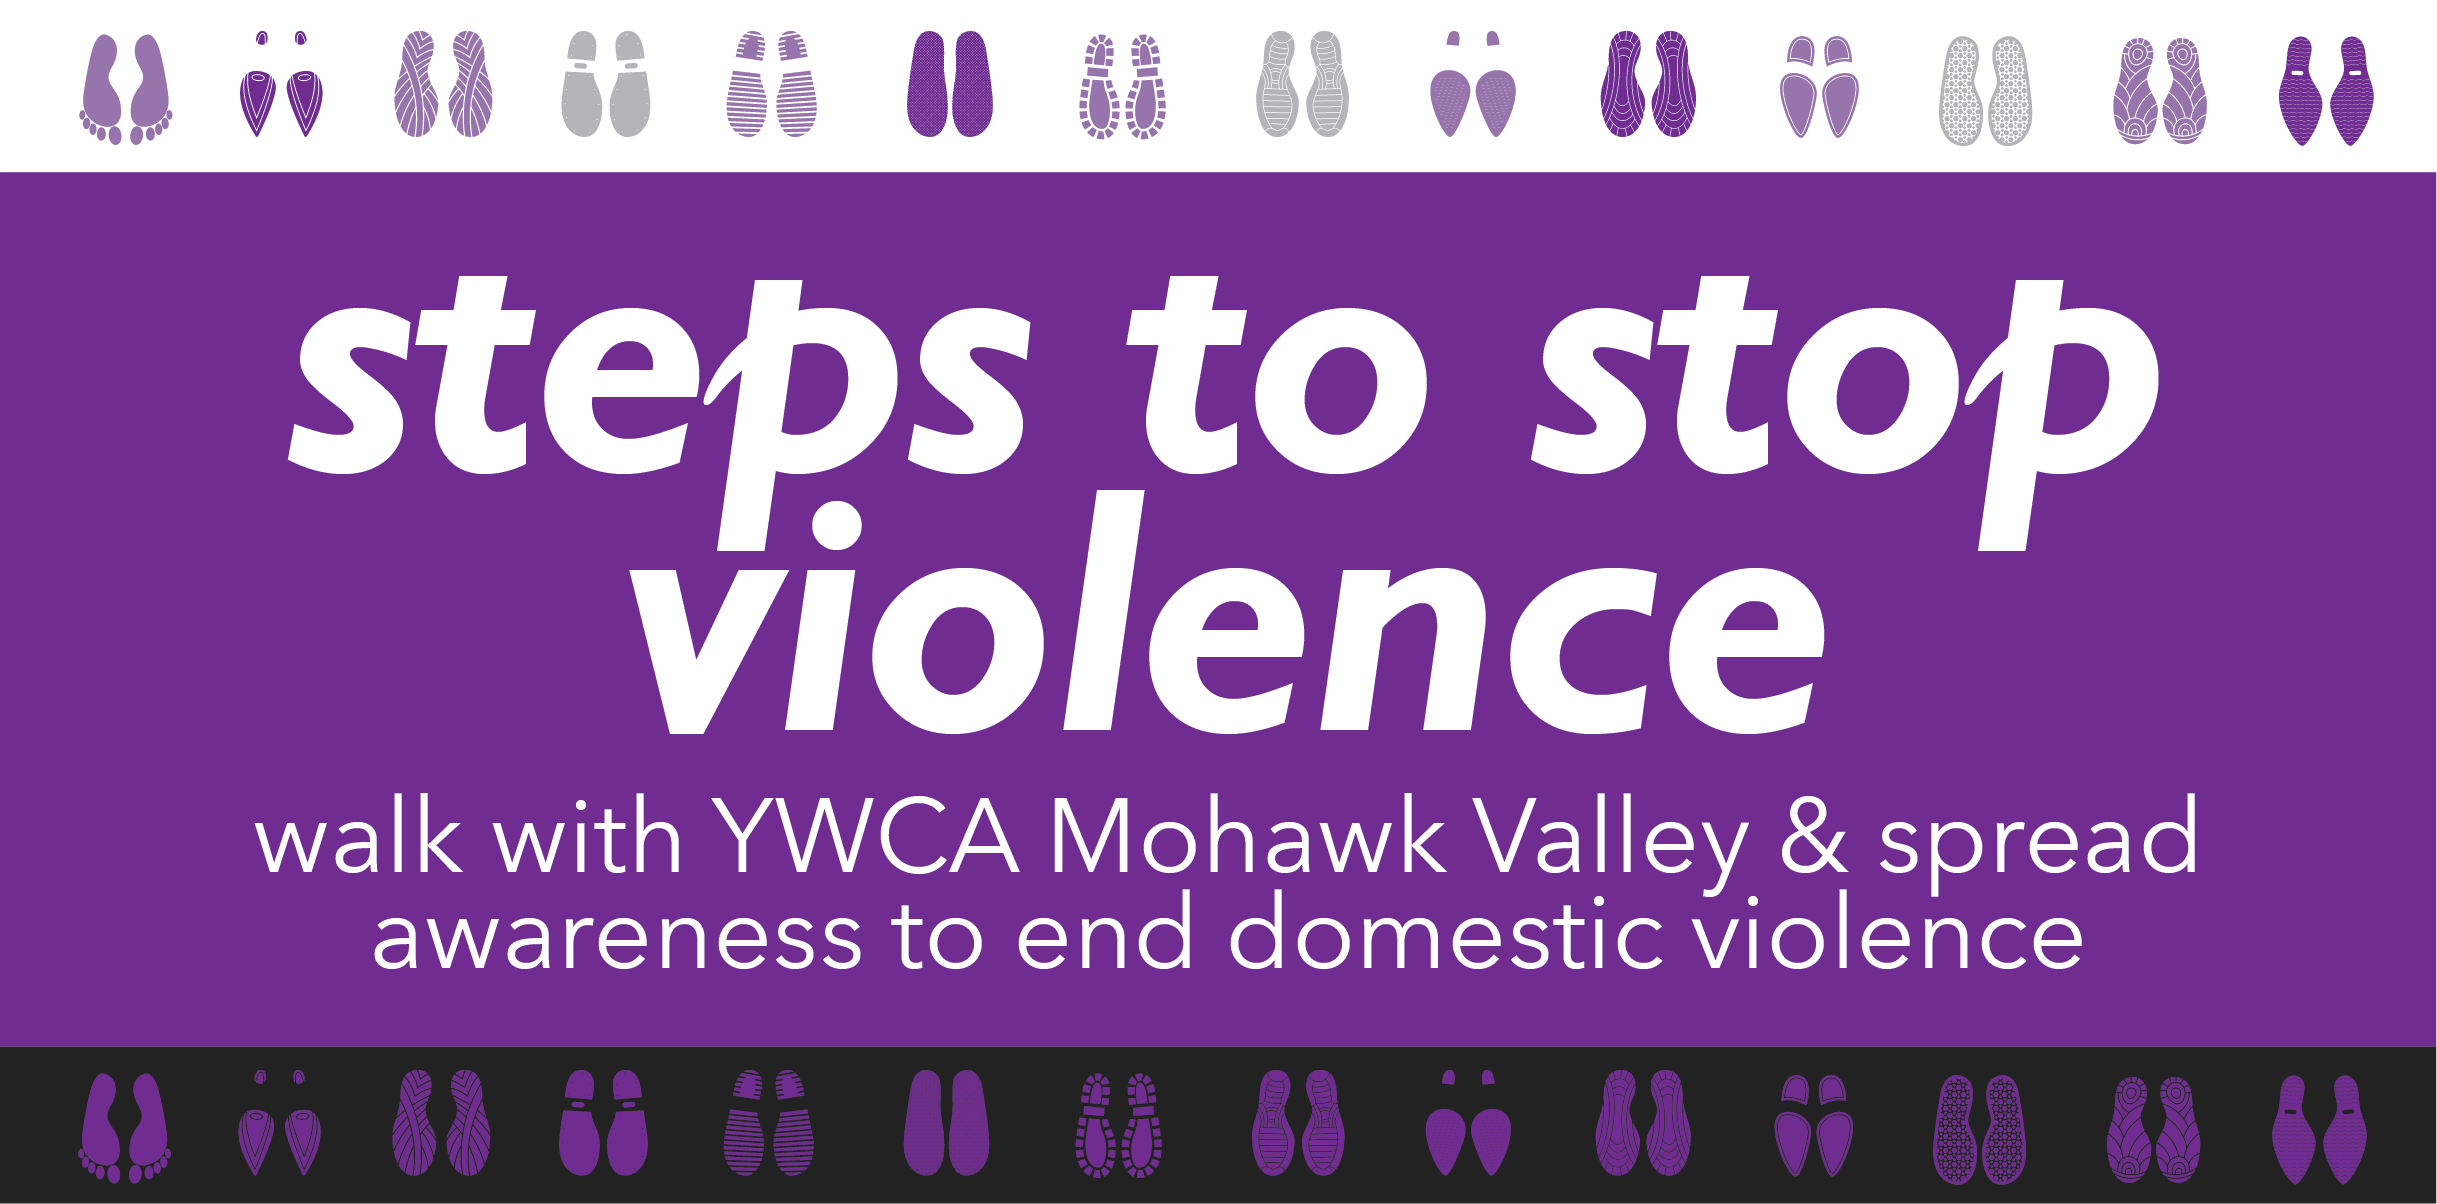 Steps to Stop Violence